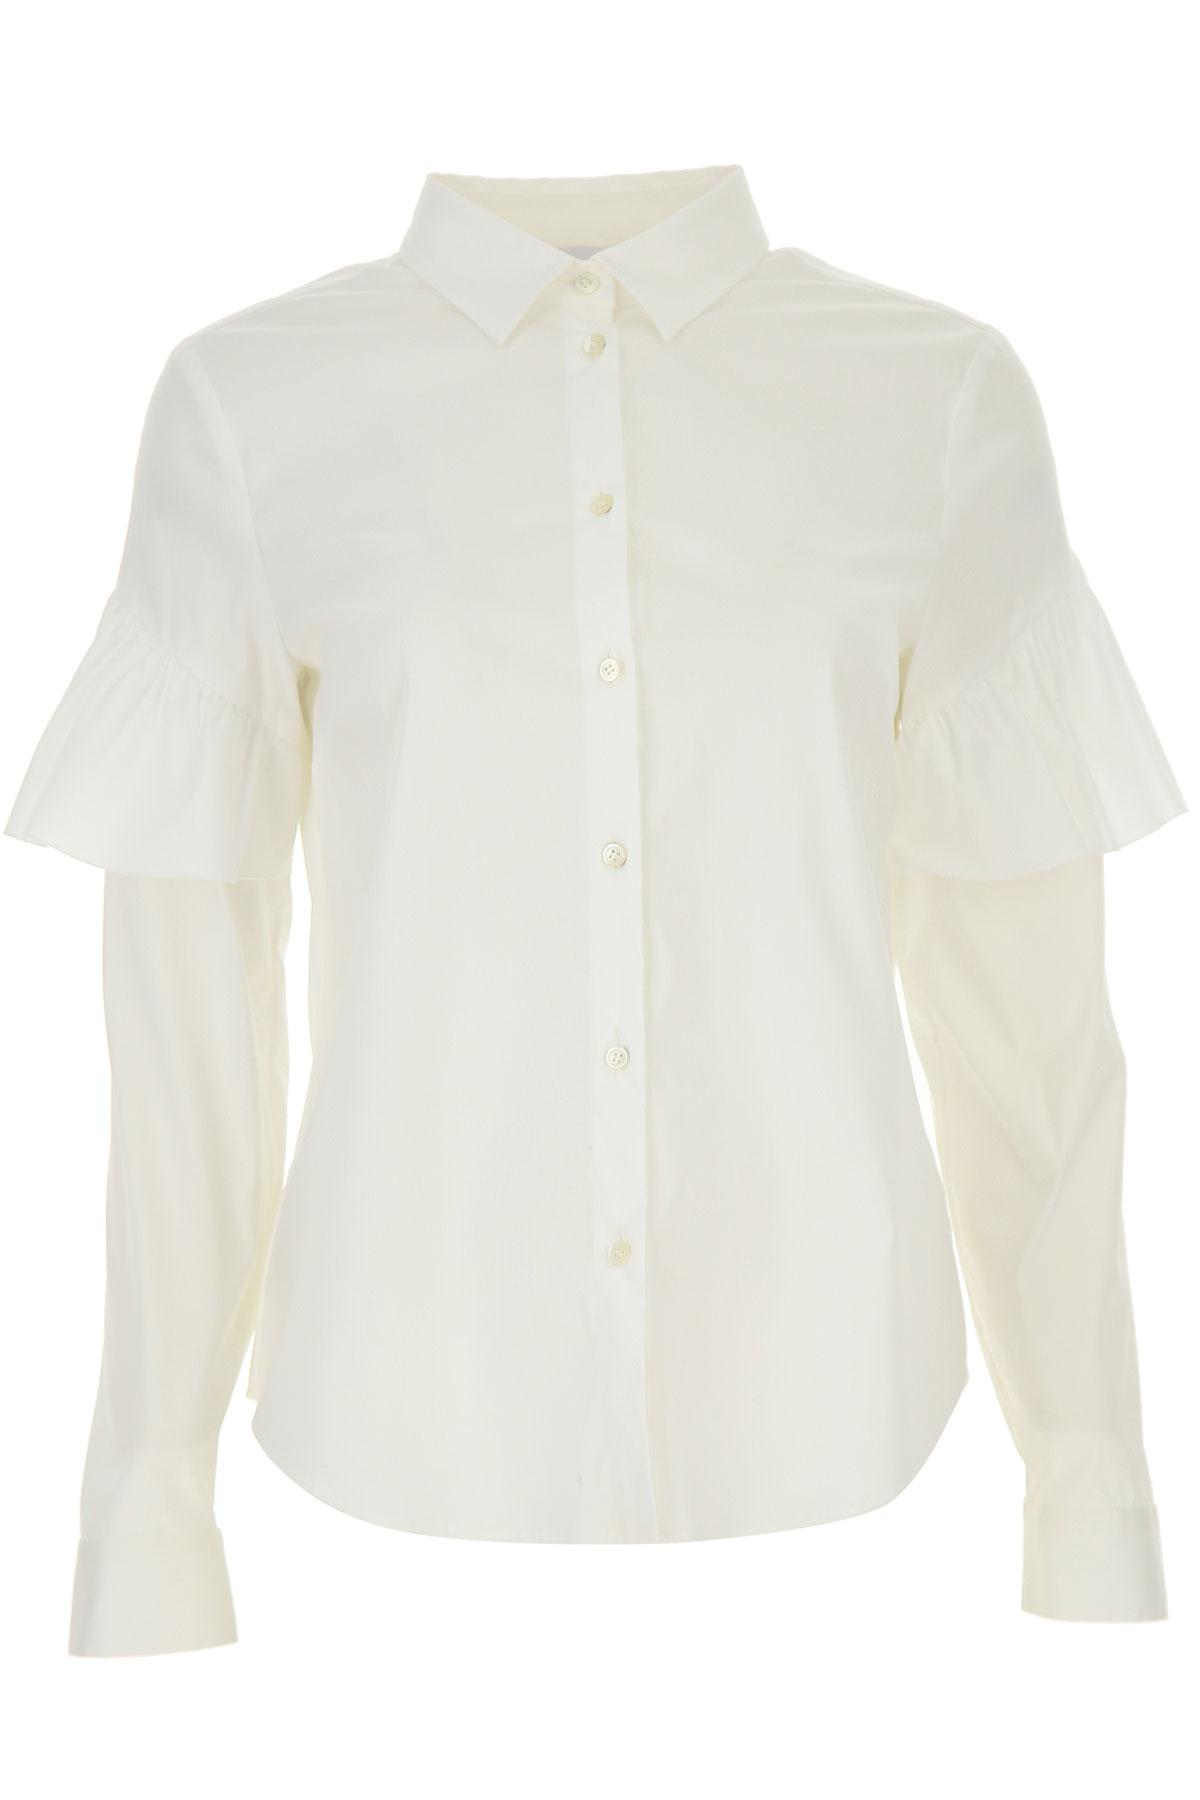 RED Valentino Chemise Femme, Blanc, Coton, 2019, 44 46 M